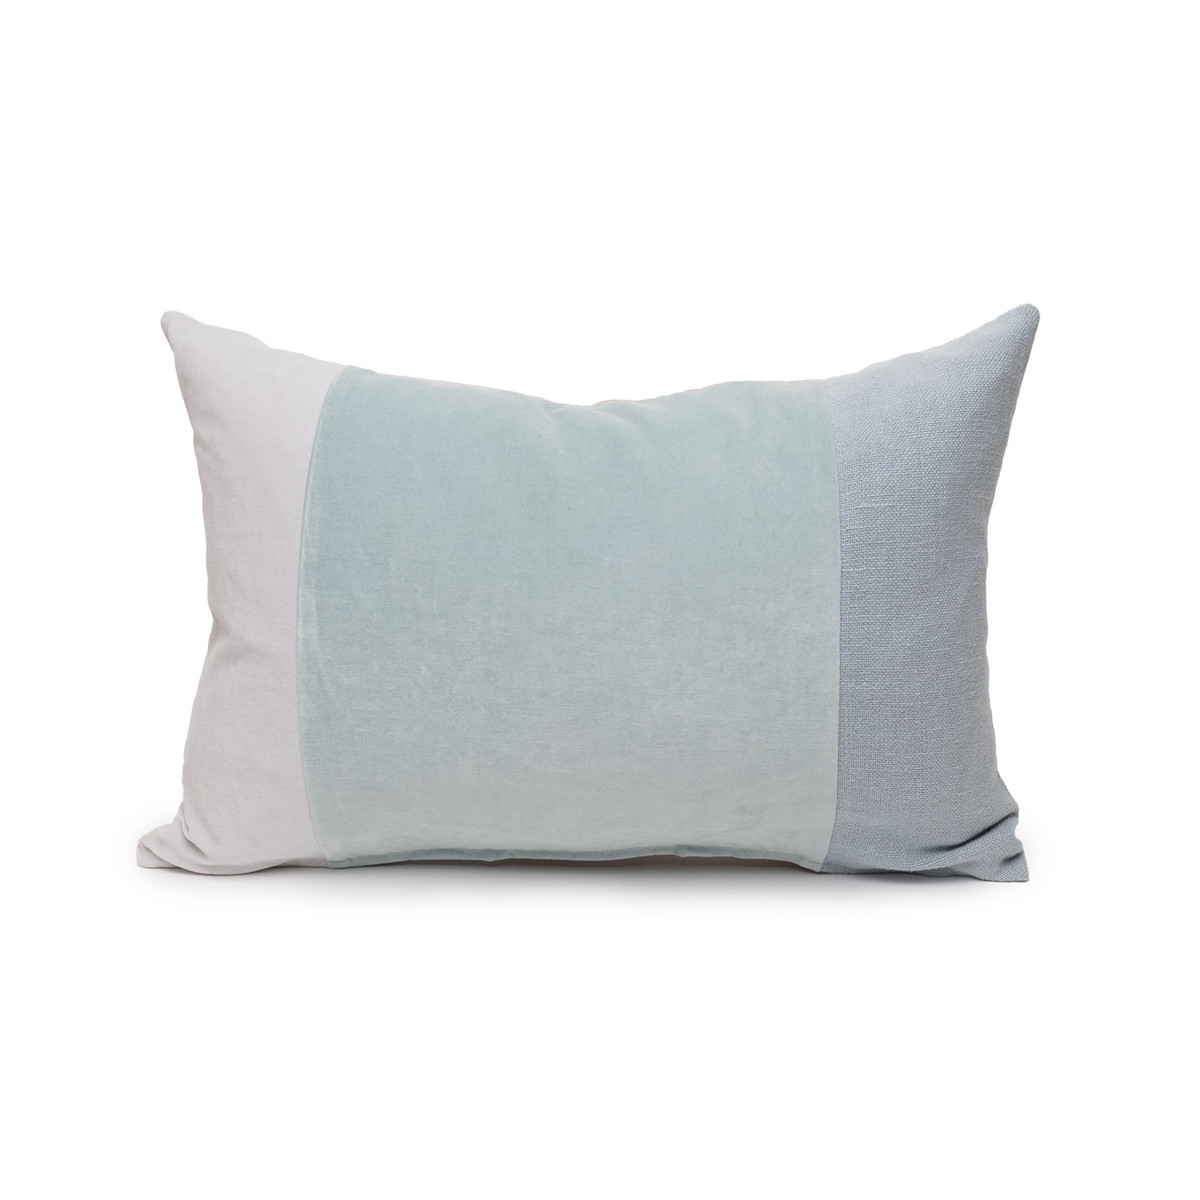 Celine Aqua Linen Velvet Lumbar Pillow - Front